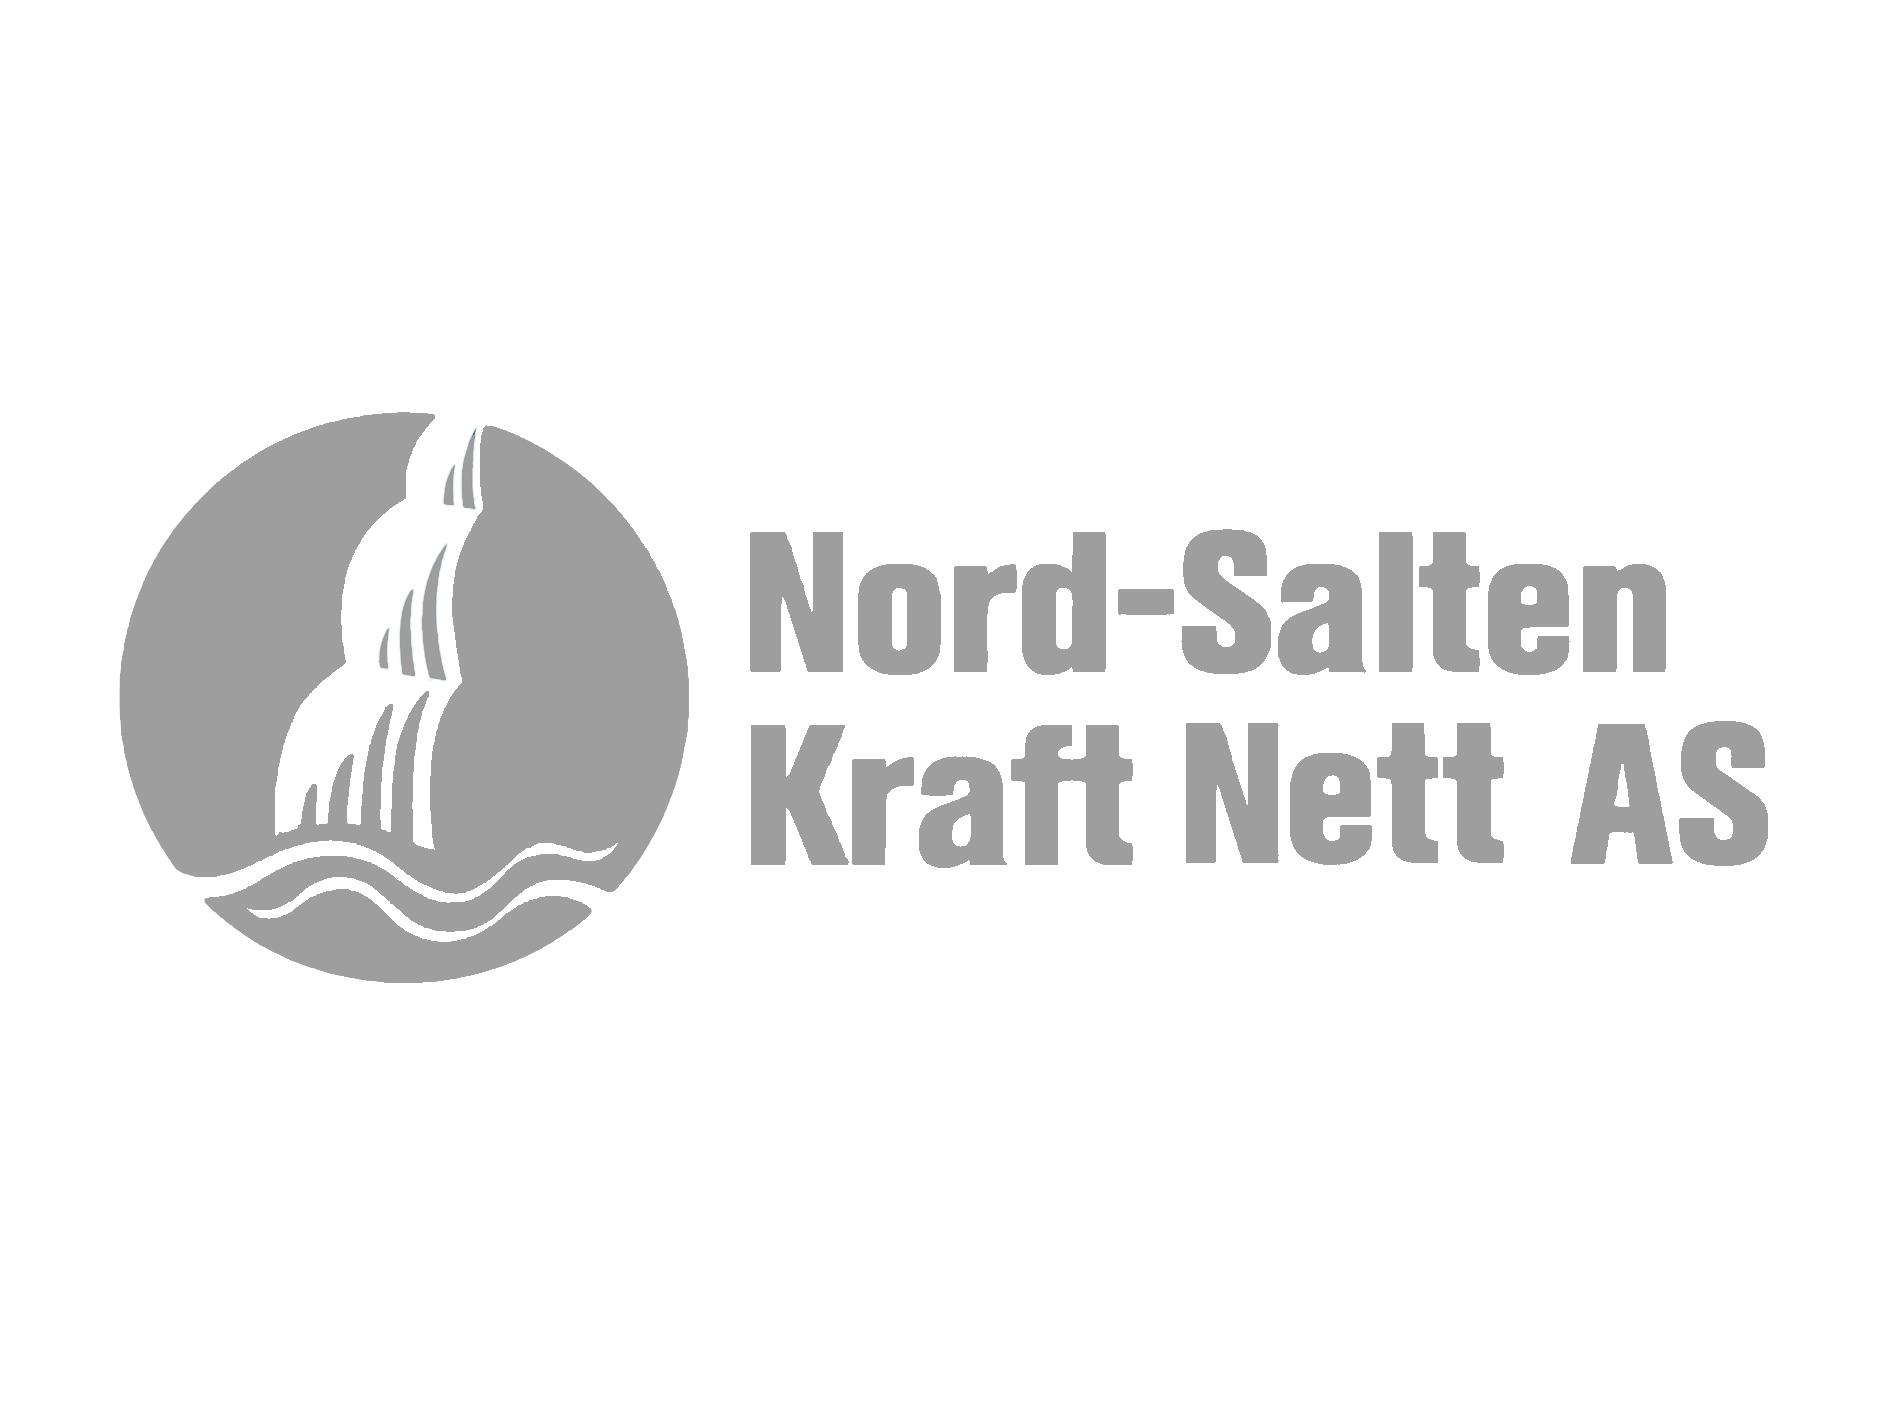 Nordsalten kraft nett AS